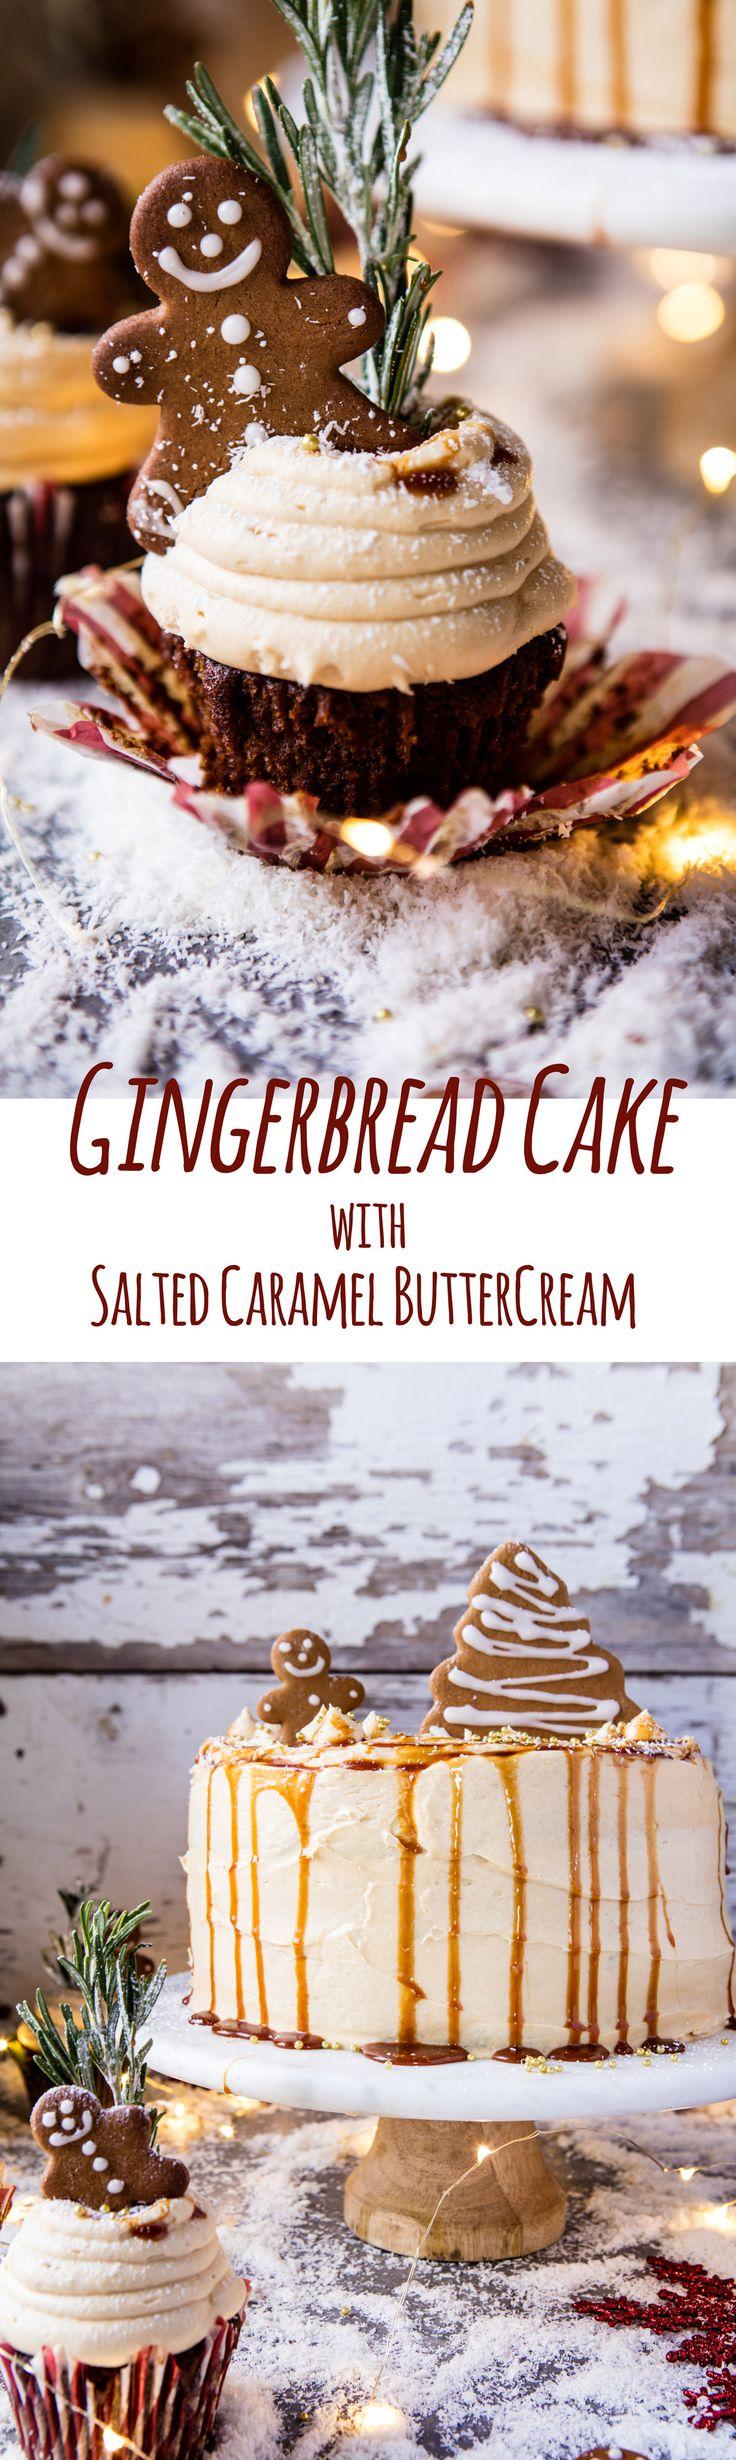 Gingerbread Cake with Caramel Cream Cheese Buttercream   halfbakedharvest.com @hbharvest